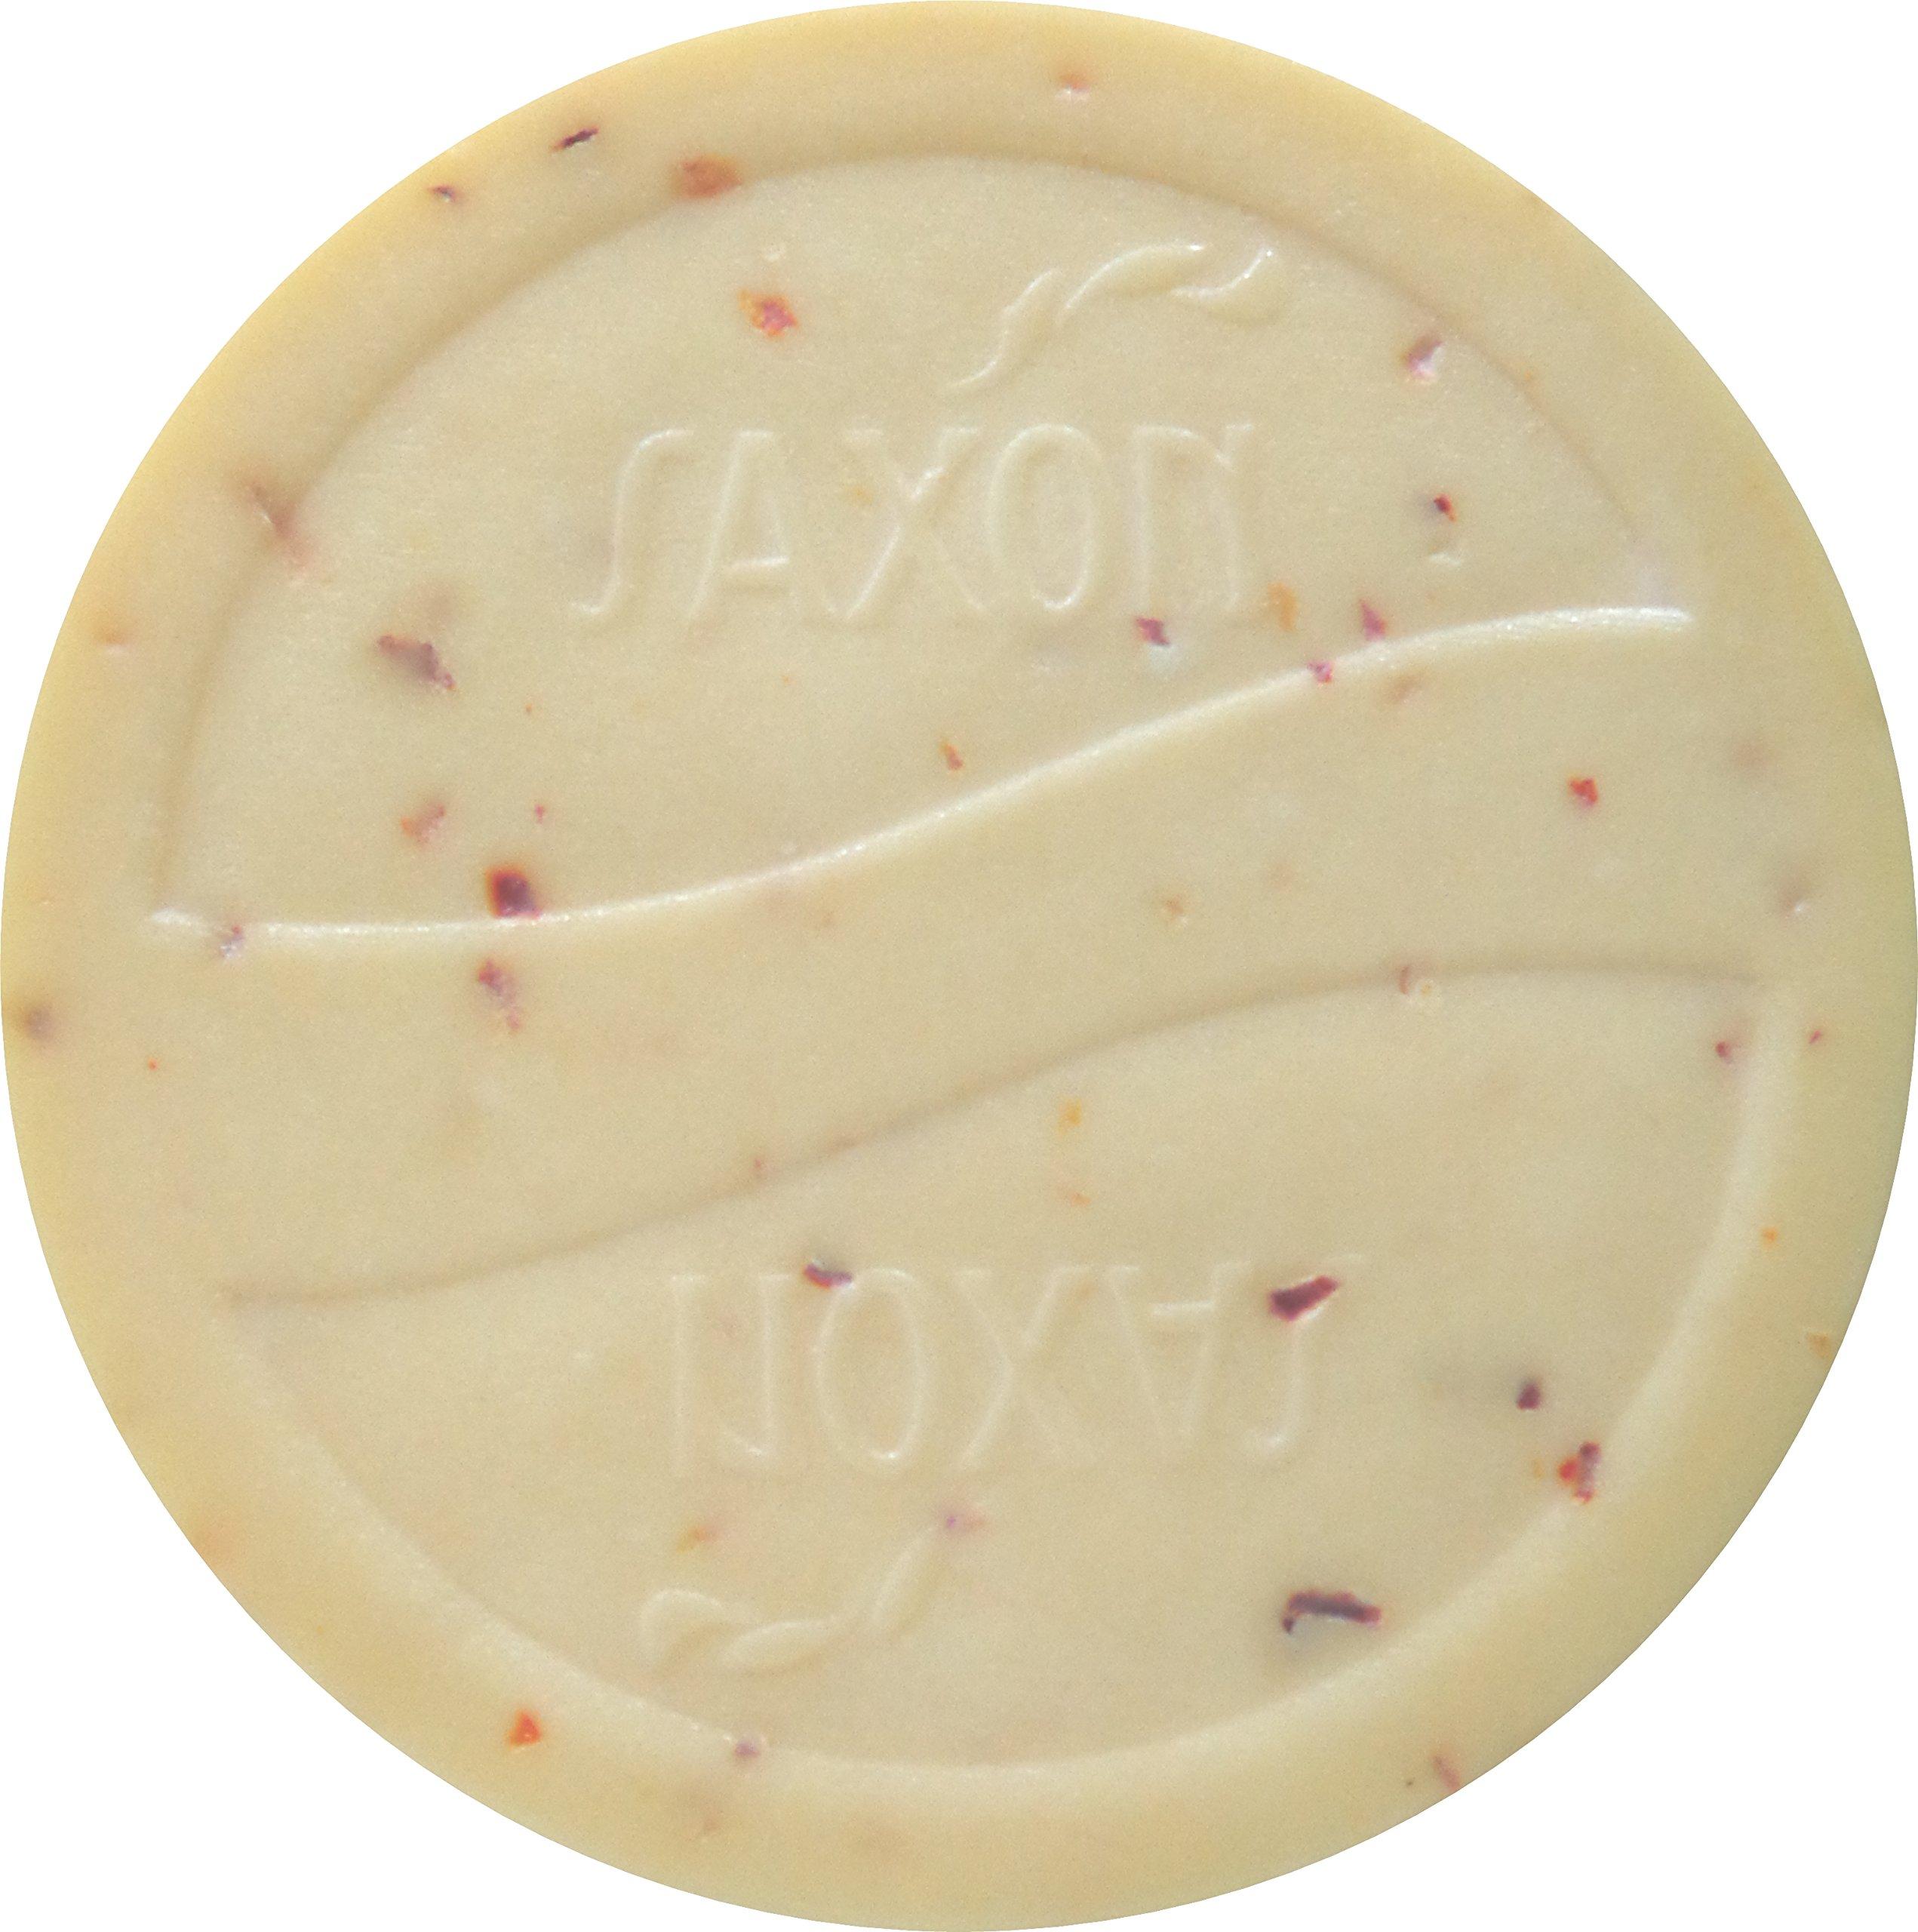 Big Eds Garlic & Pimento Gouda 12lb Wheel by Saxon Creamery